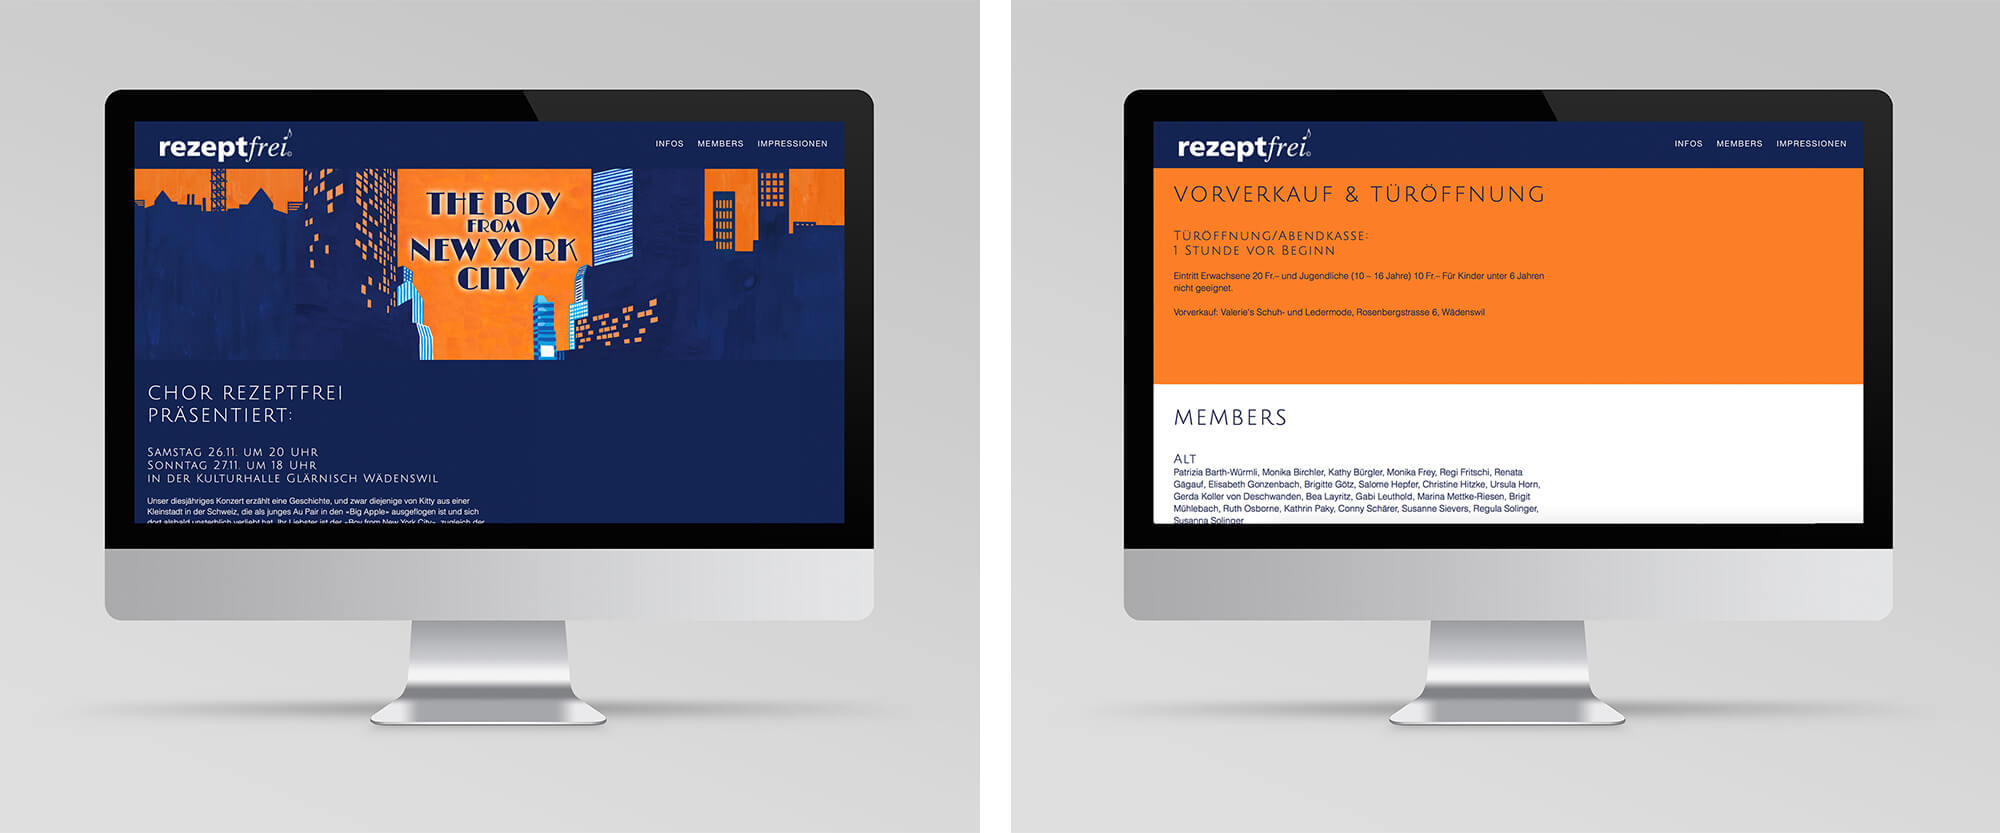 Rezeptfrei_2016_Webdesign_Concrete5_Kim-Arbenz